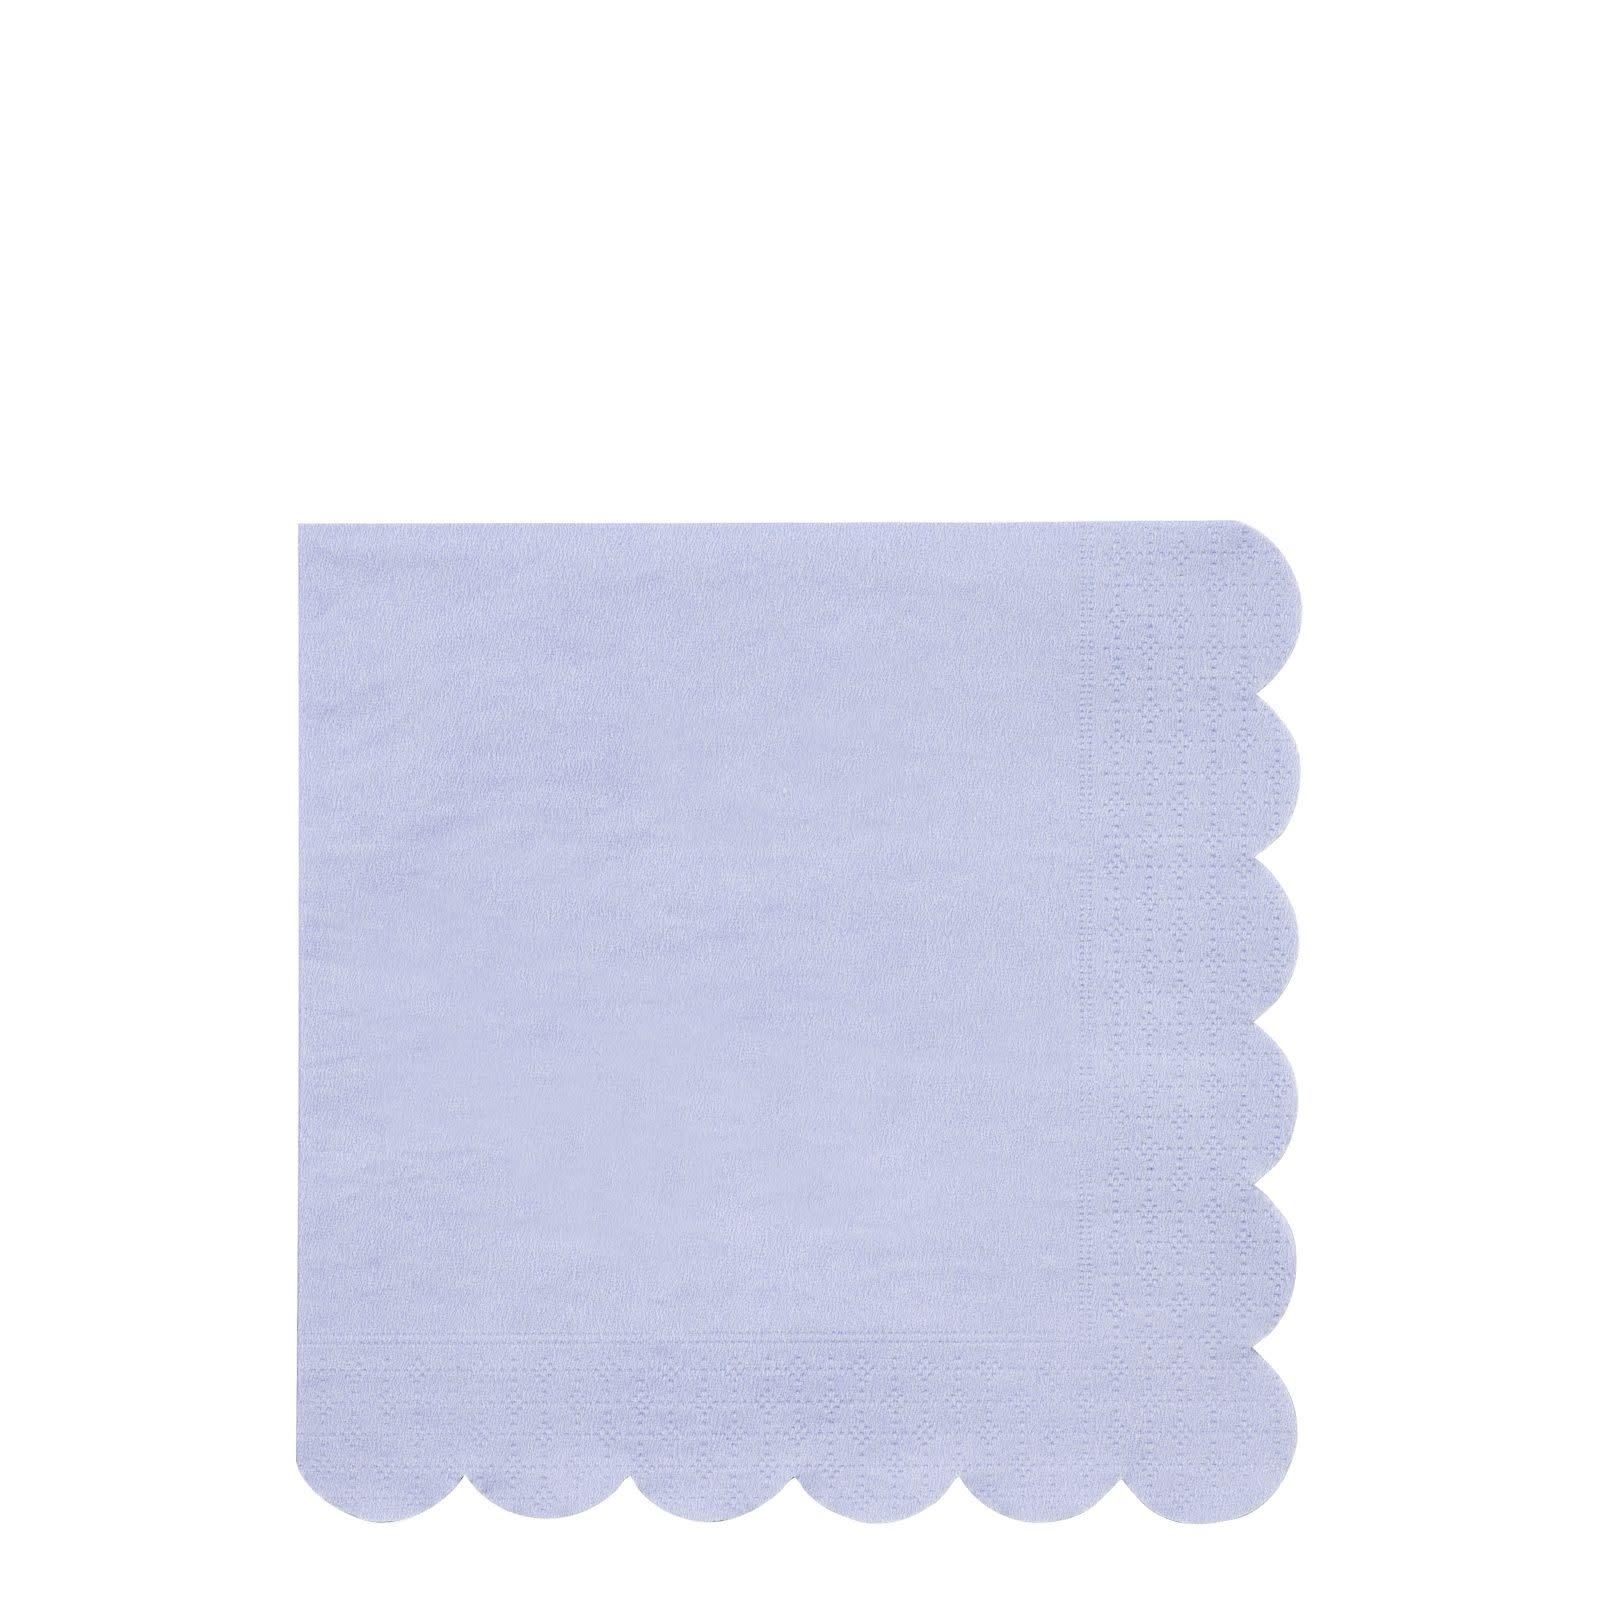 MERIMERI Blue simply eco napkins L